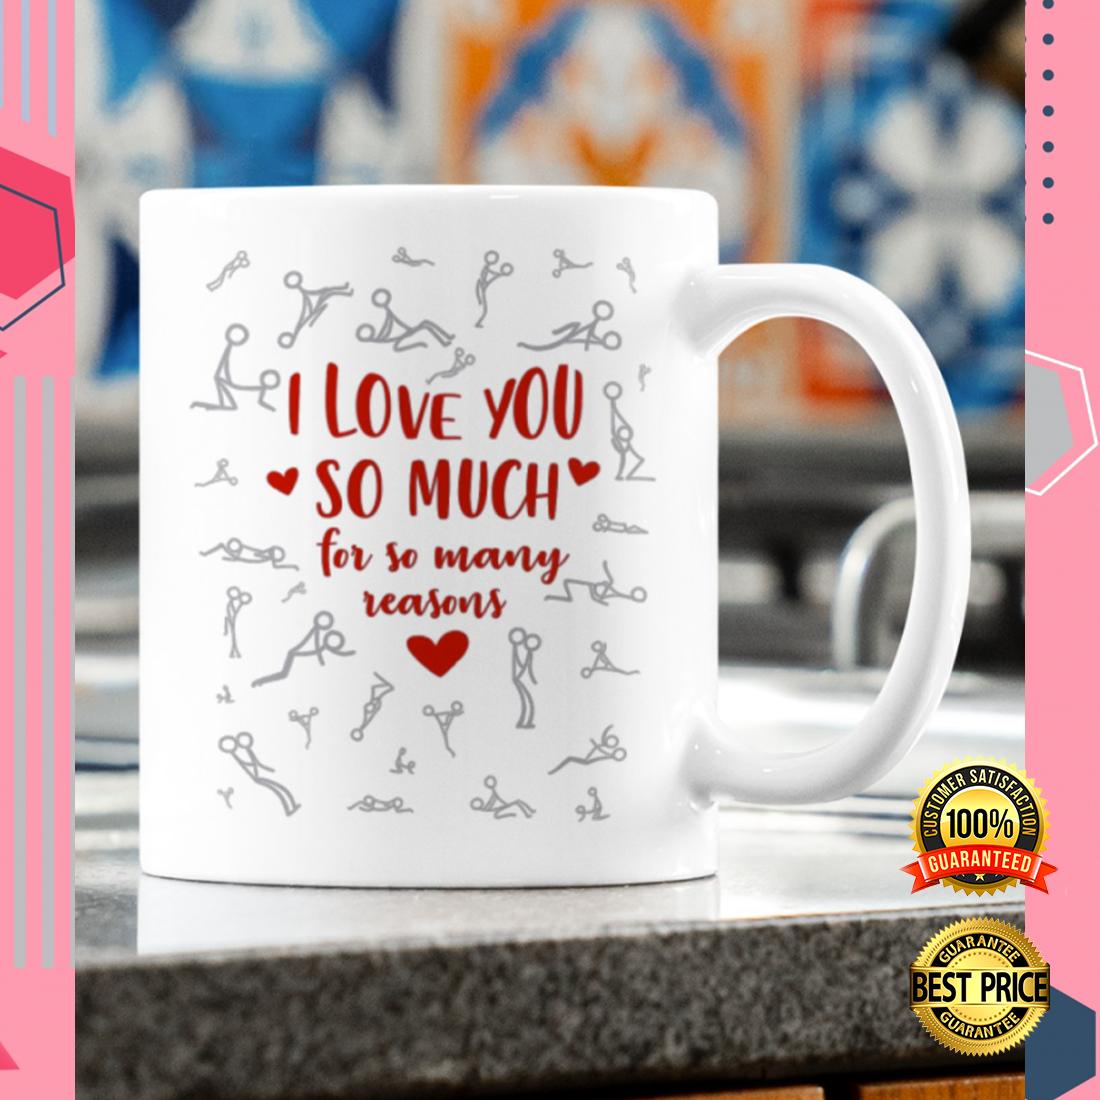 I love you so much for so many reasons mug 1